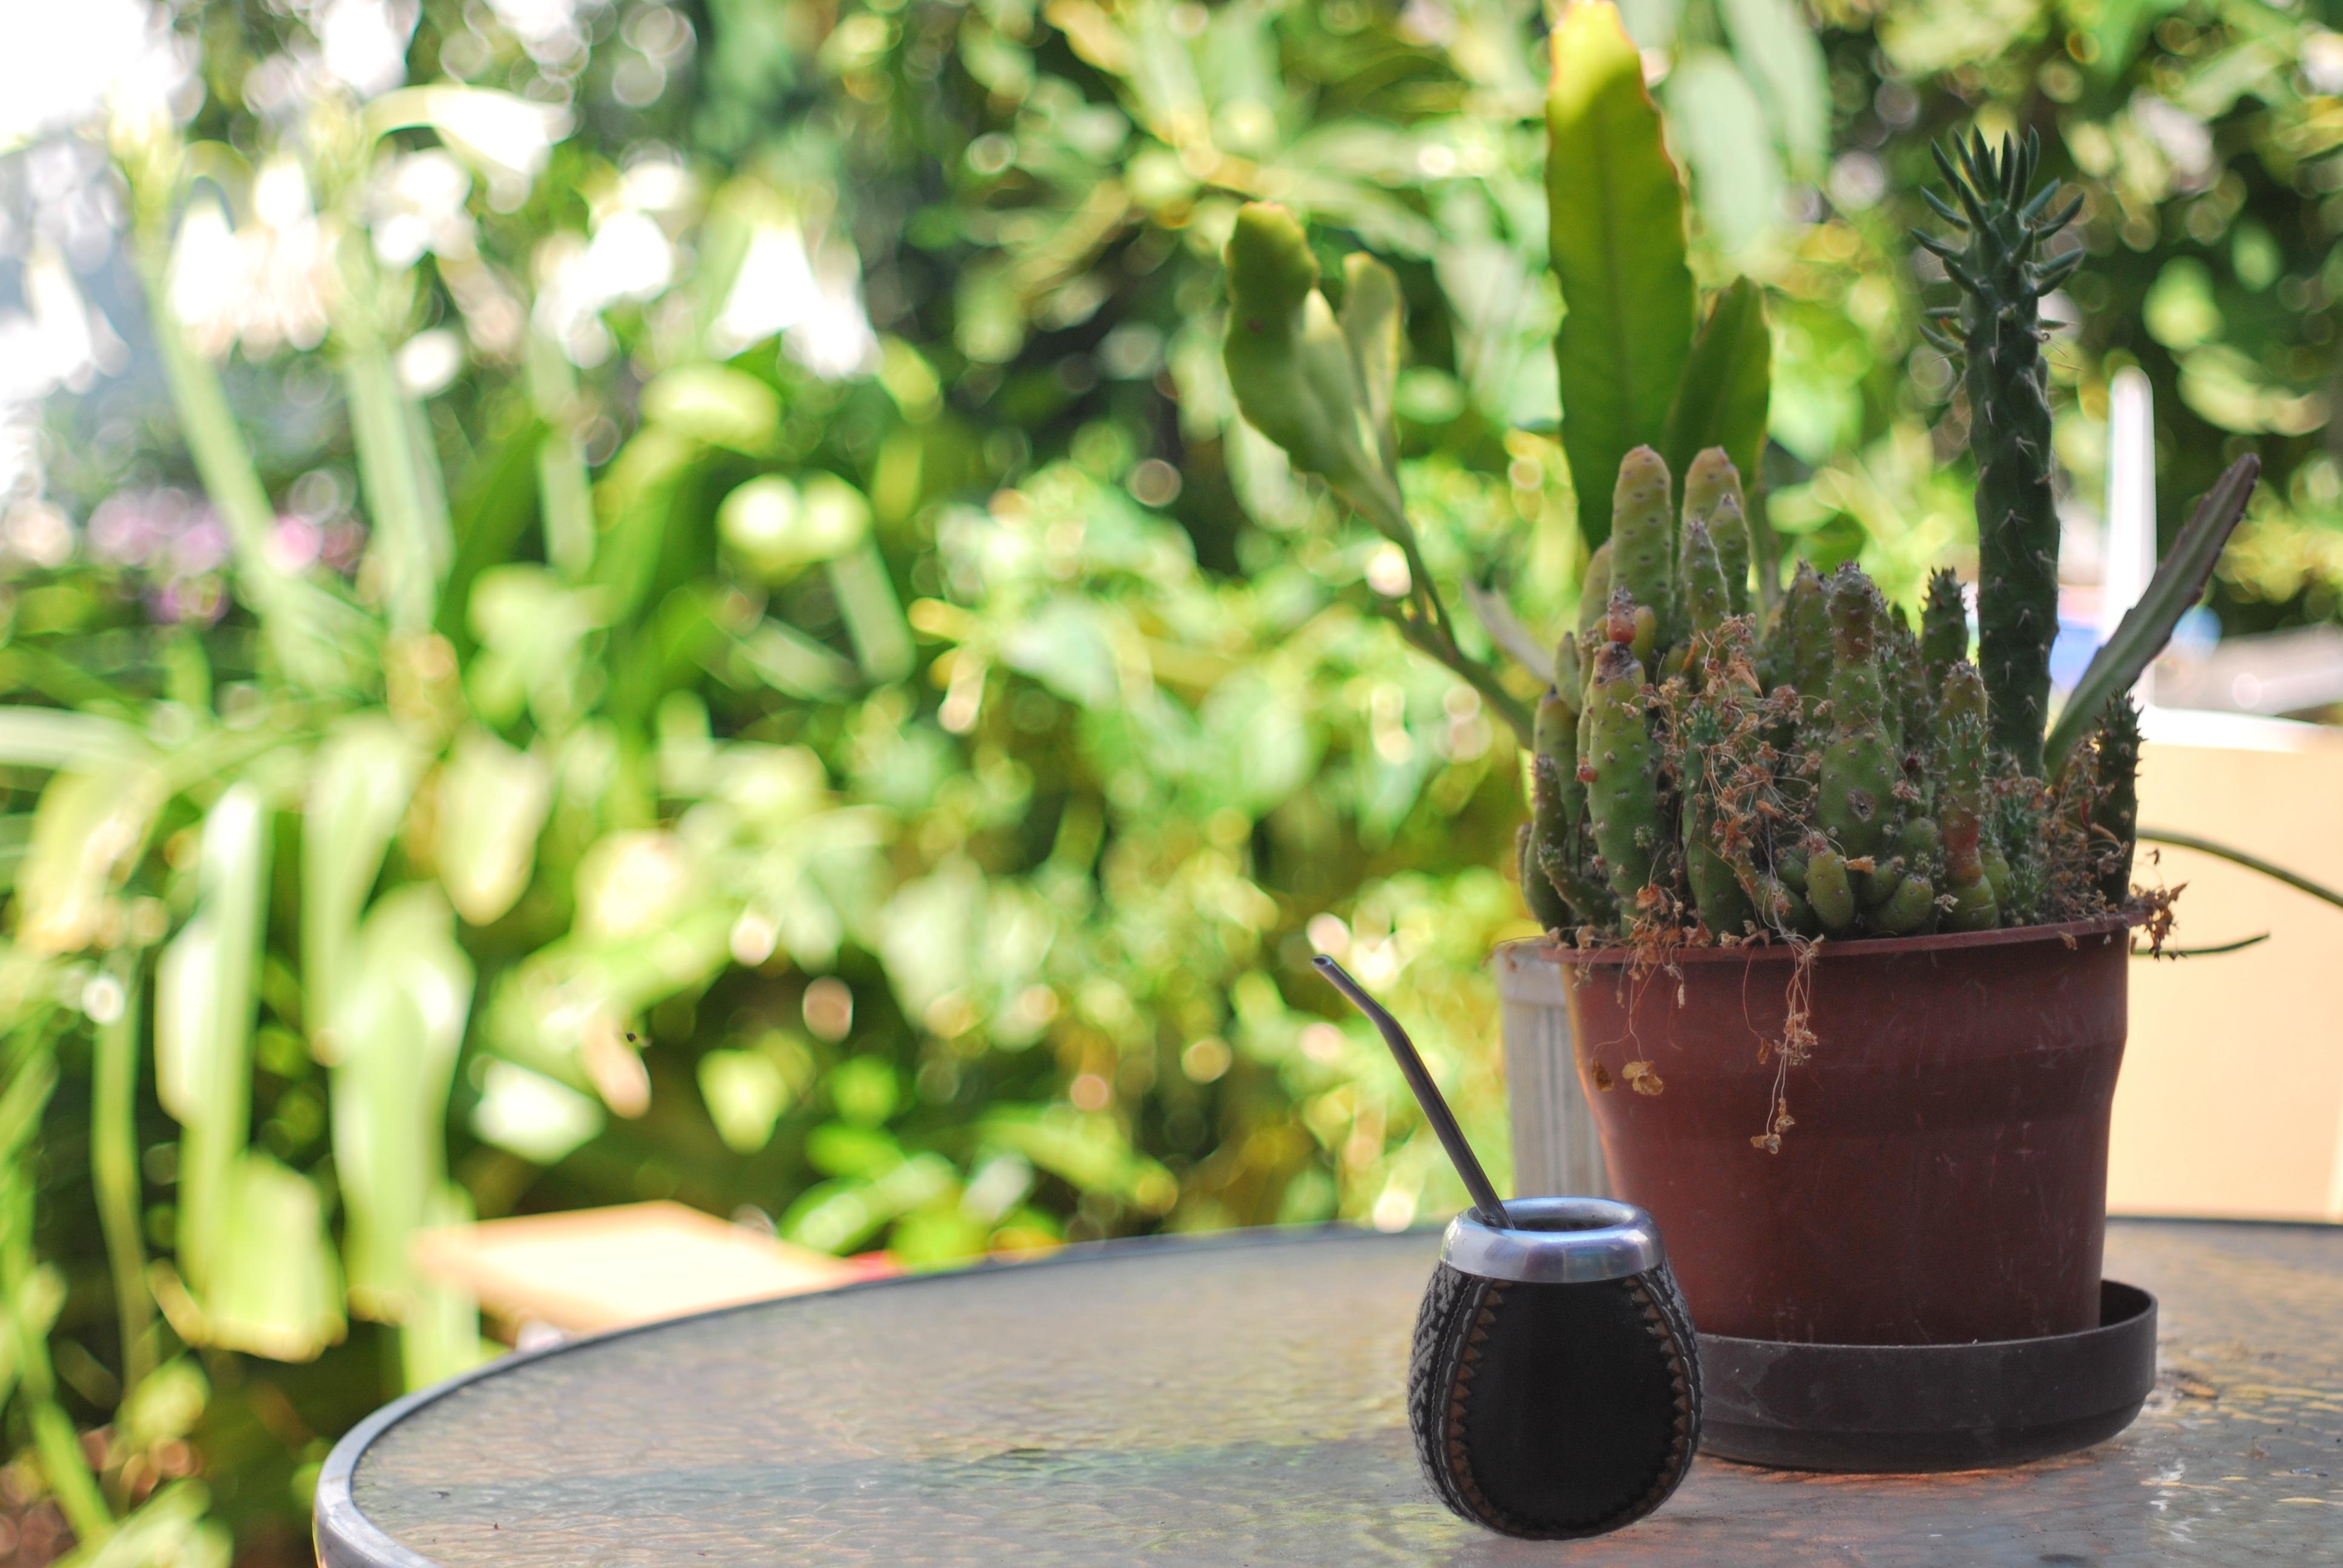 free images lawn flower green produce backyard soil botany